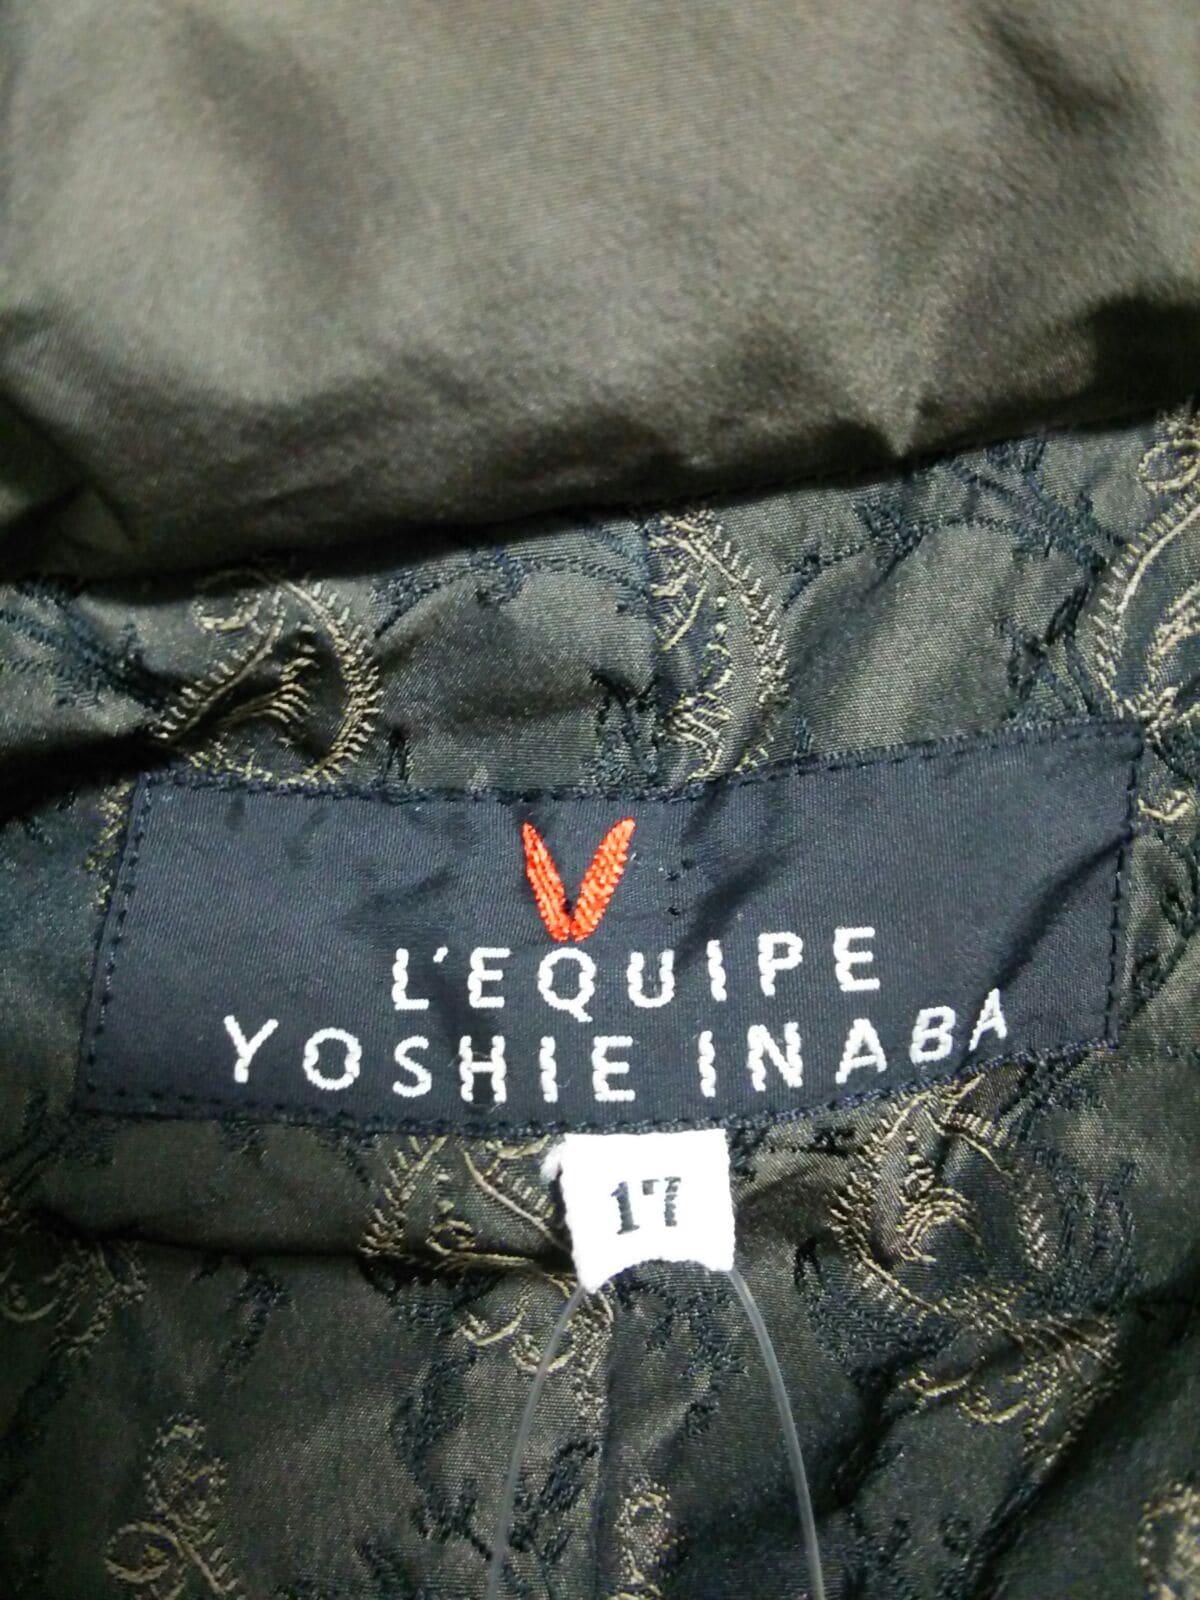 L'EQUIPEYOSHIEINABA(レキップ ヨシエイナバ)のダウンジャケット